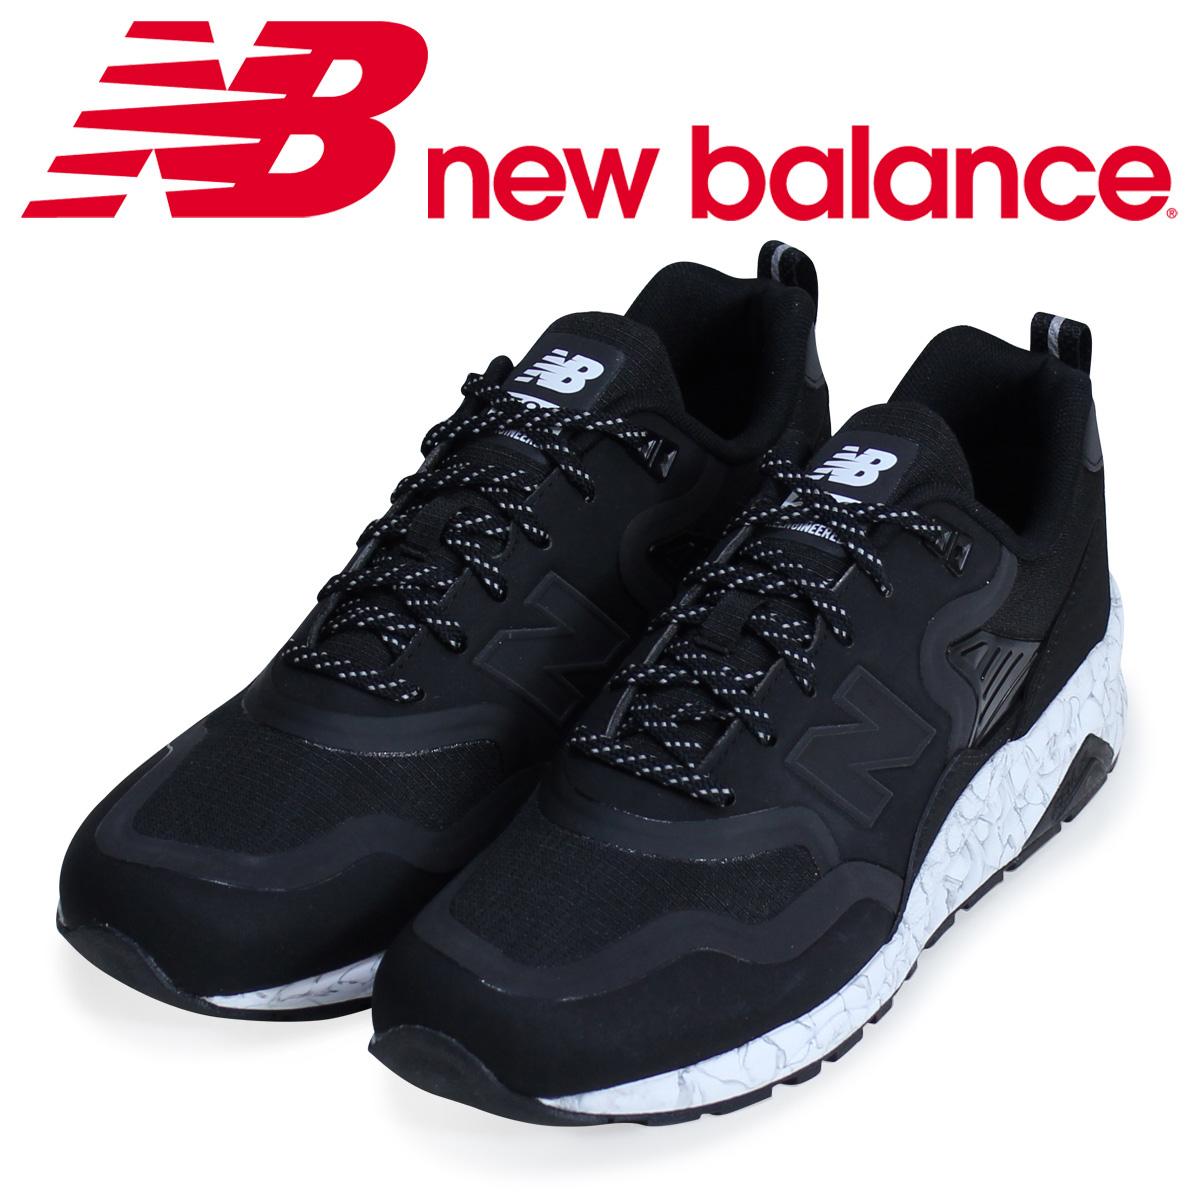 new balance 22